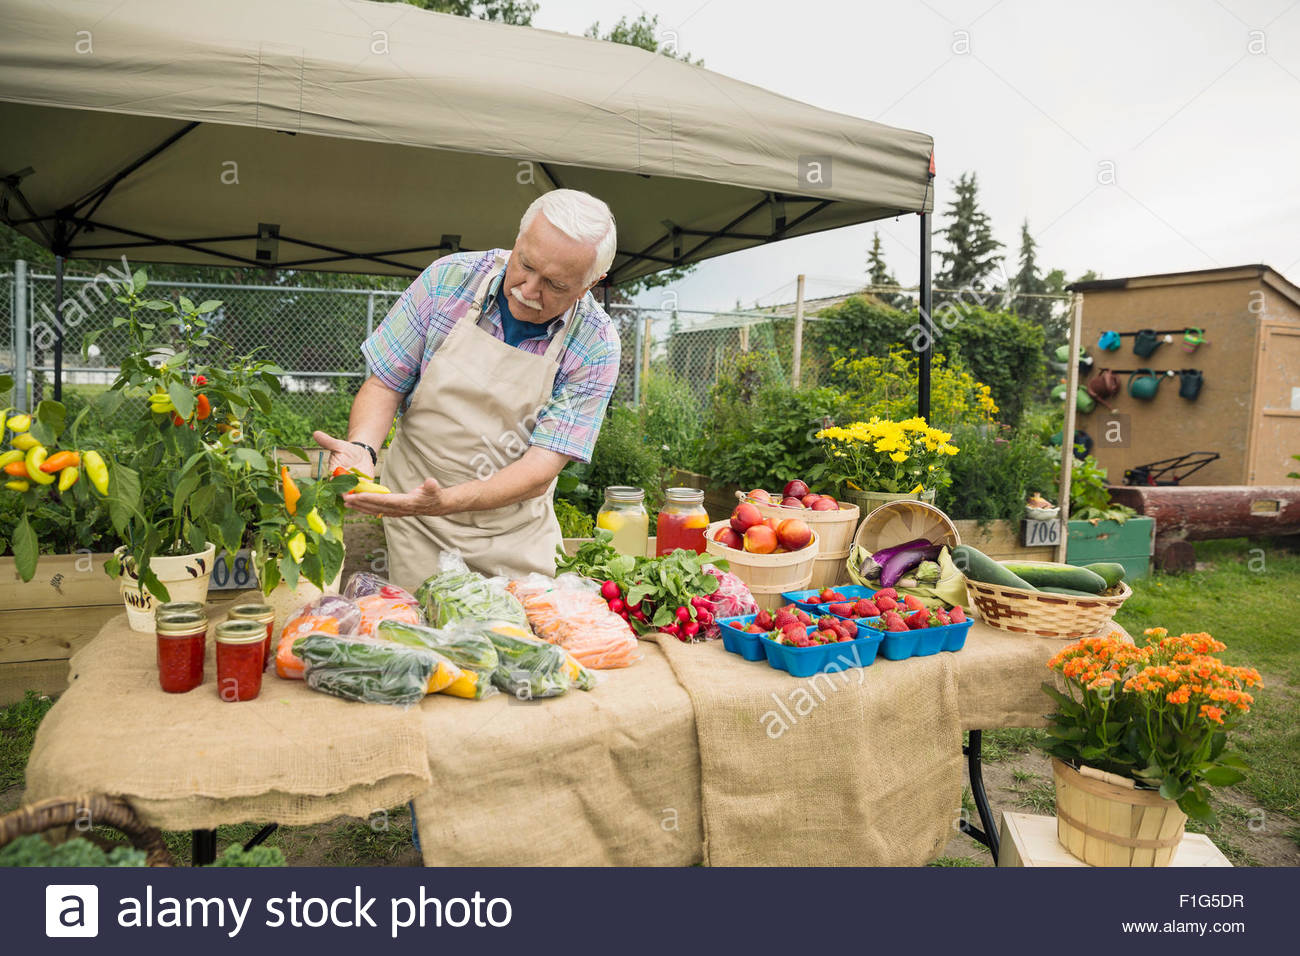 Senior farmer checking produce farmers market stall - Stock Image